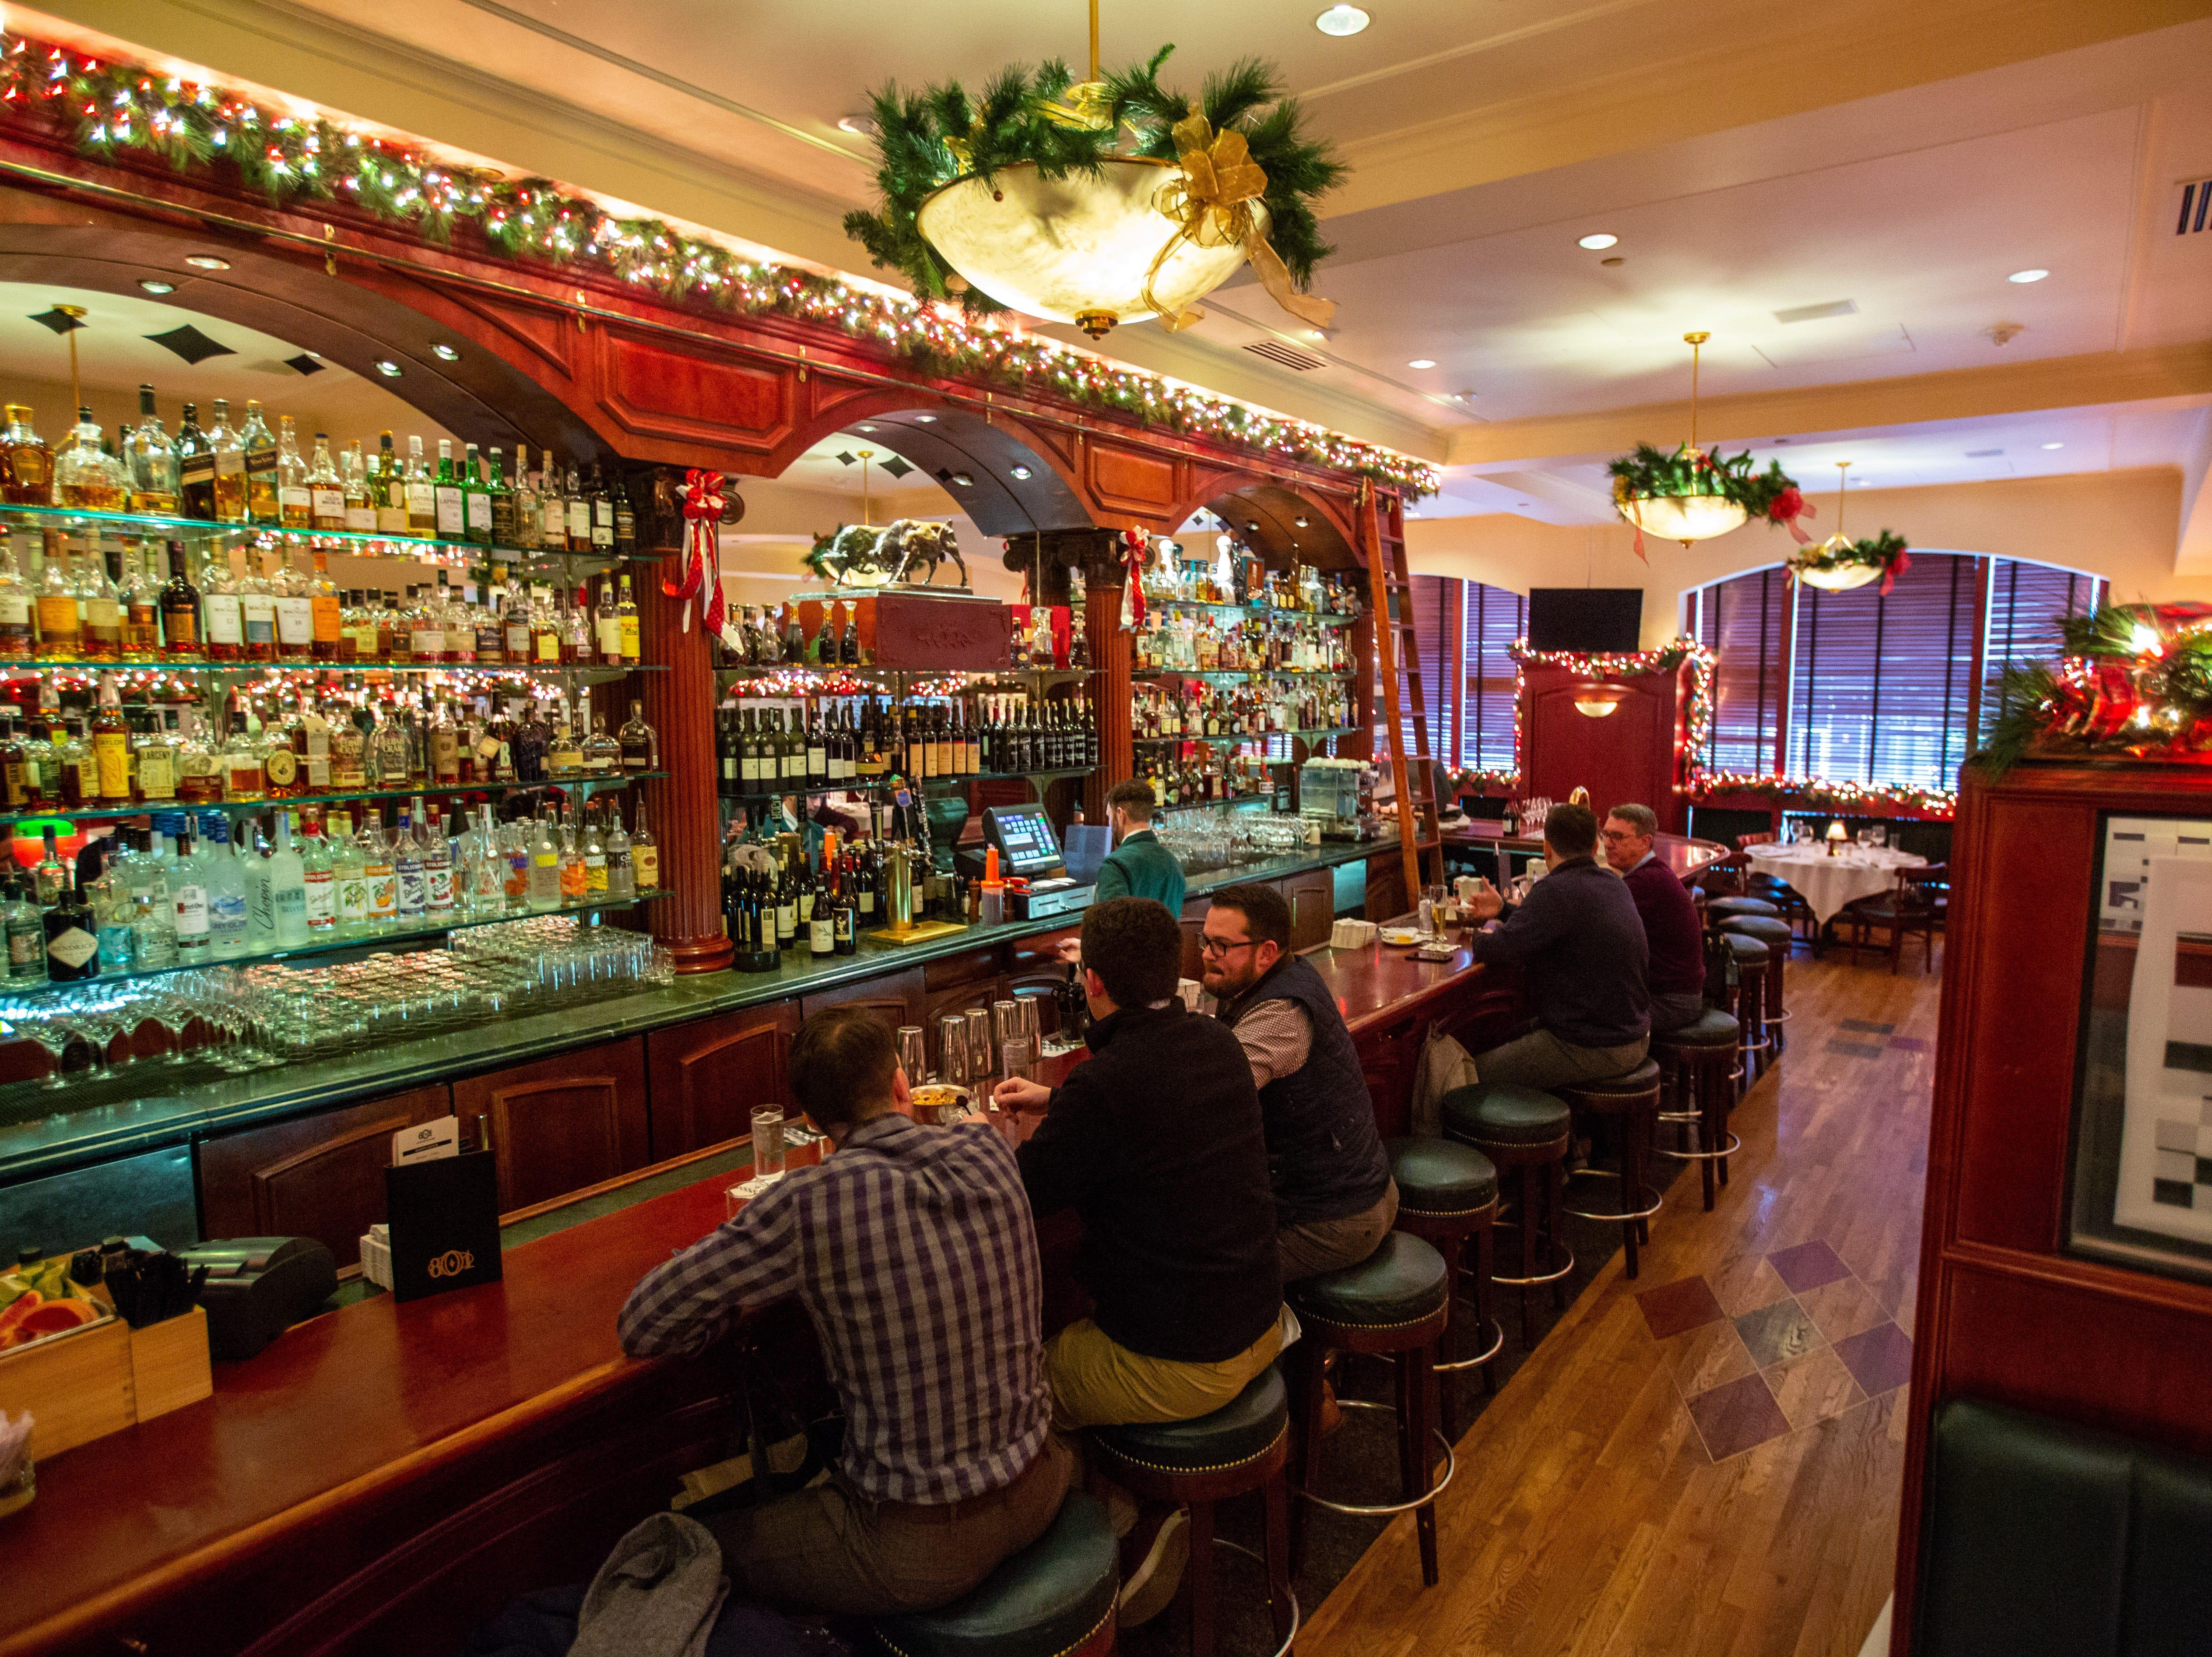 The bar at 801 Chophouse Wednesday, Dec. 5, 2018.